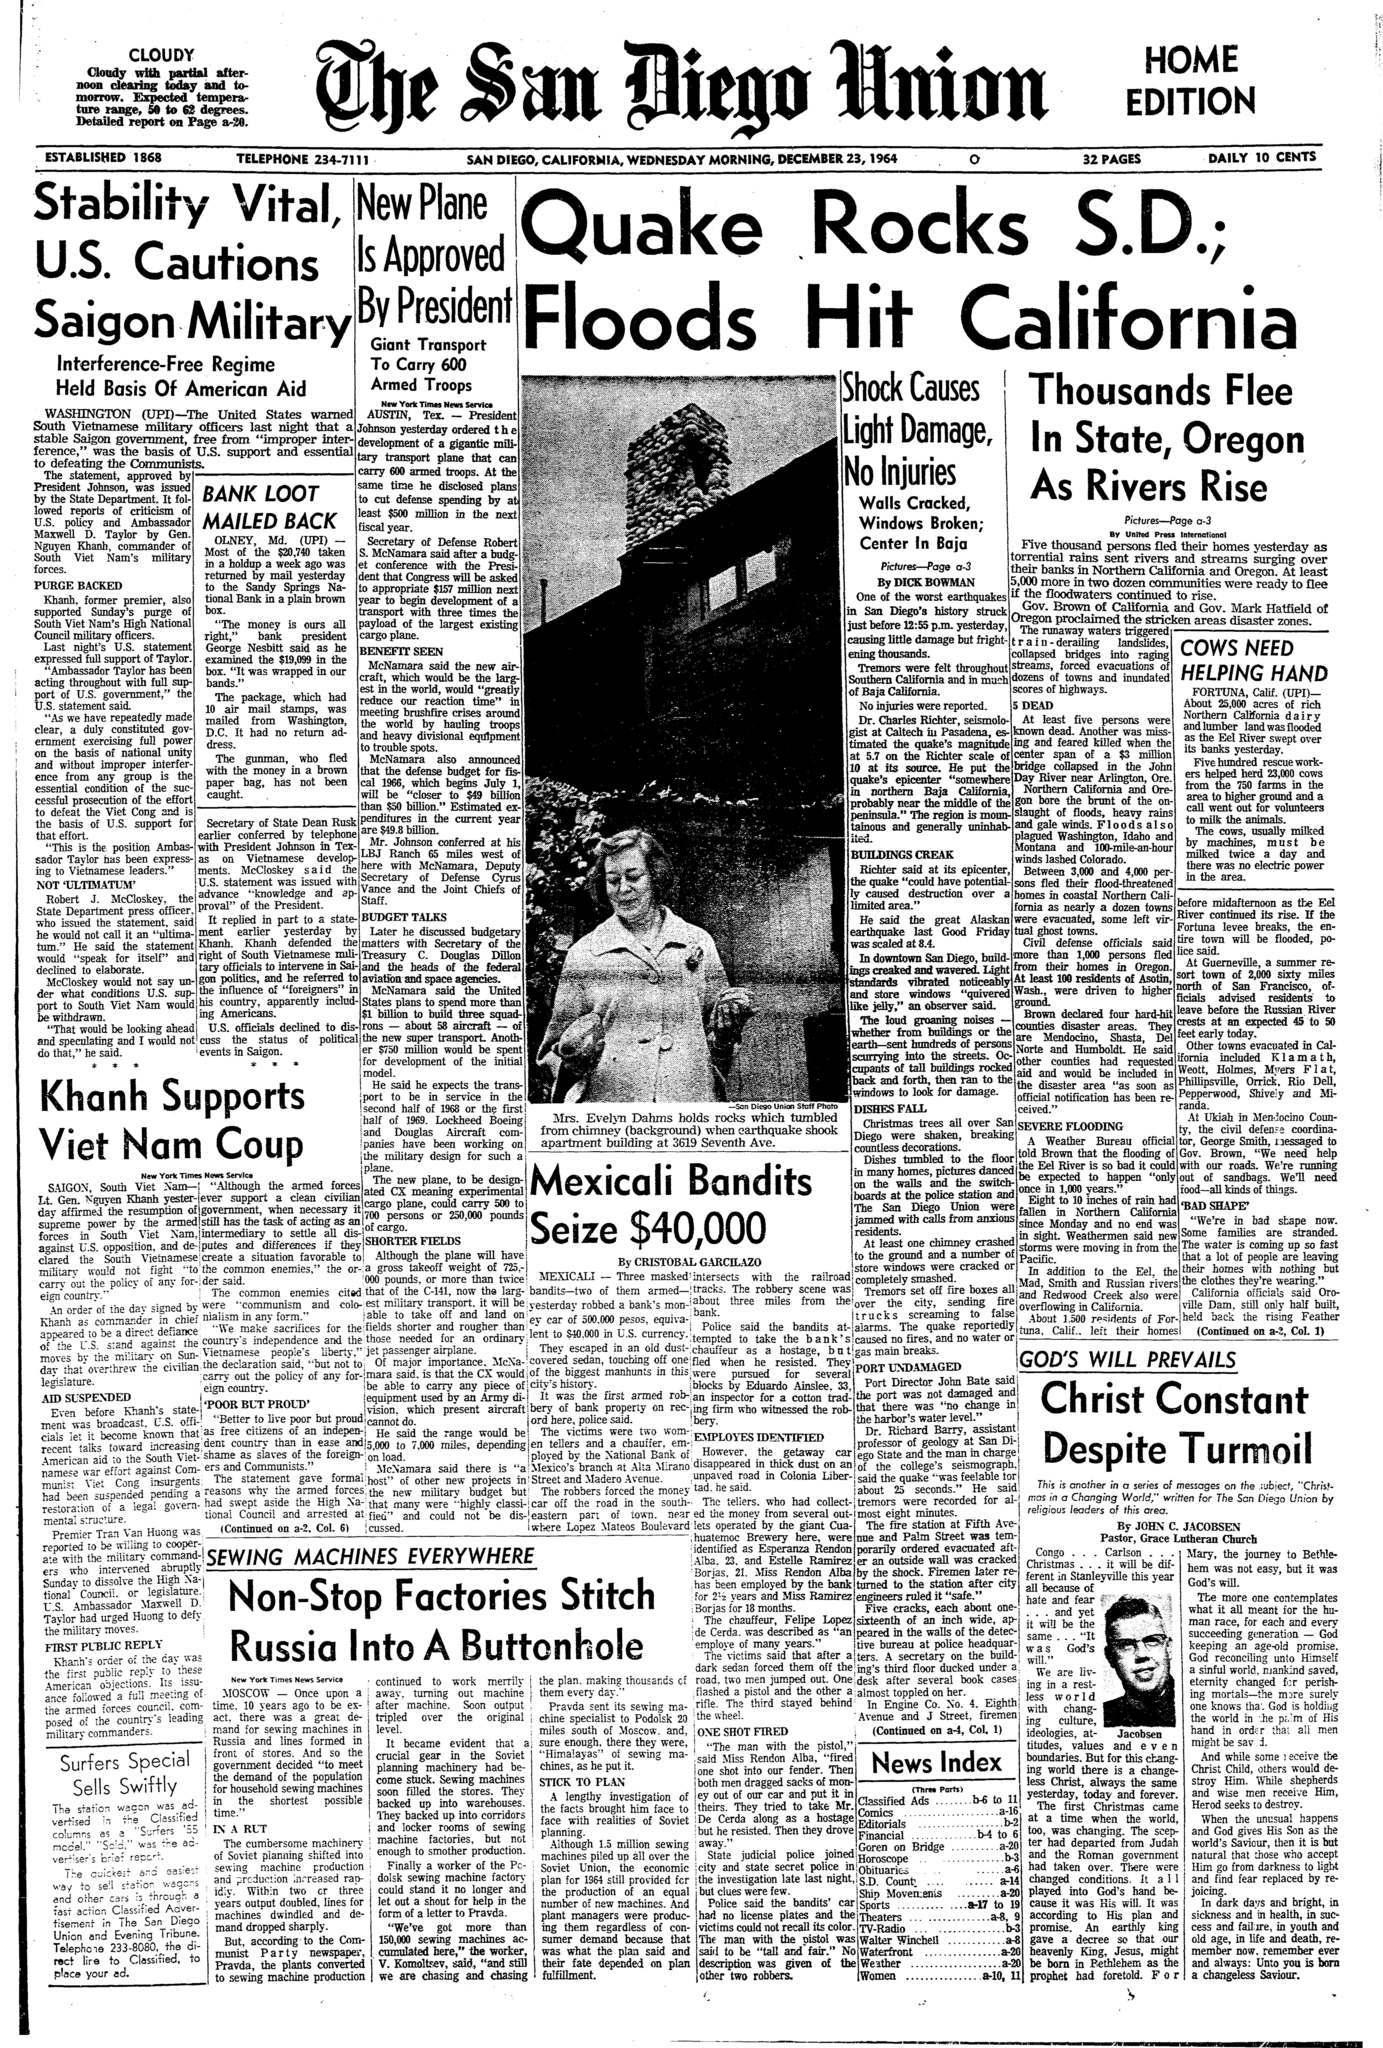 December 23, 1964